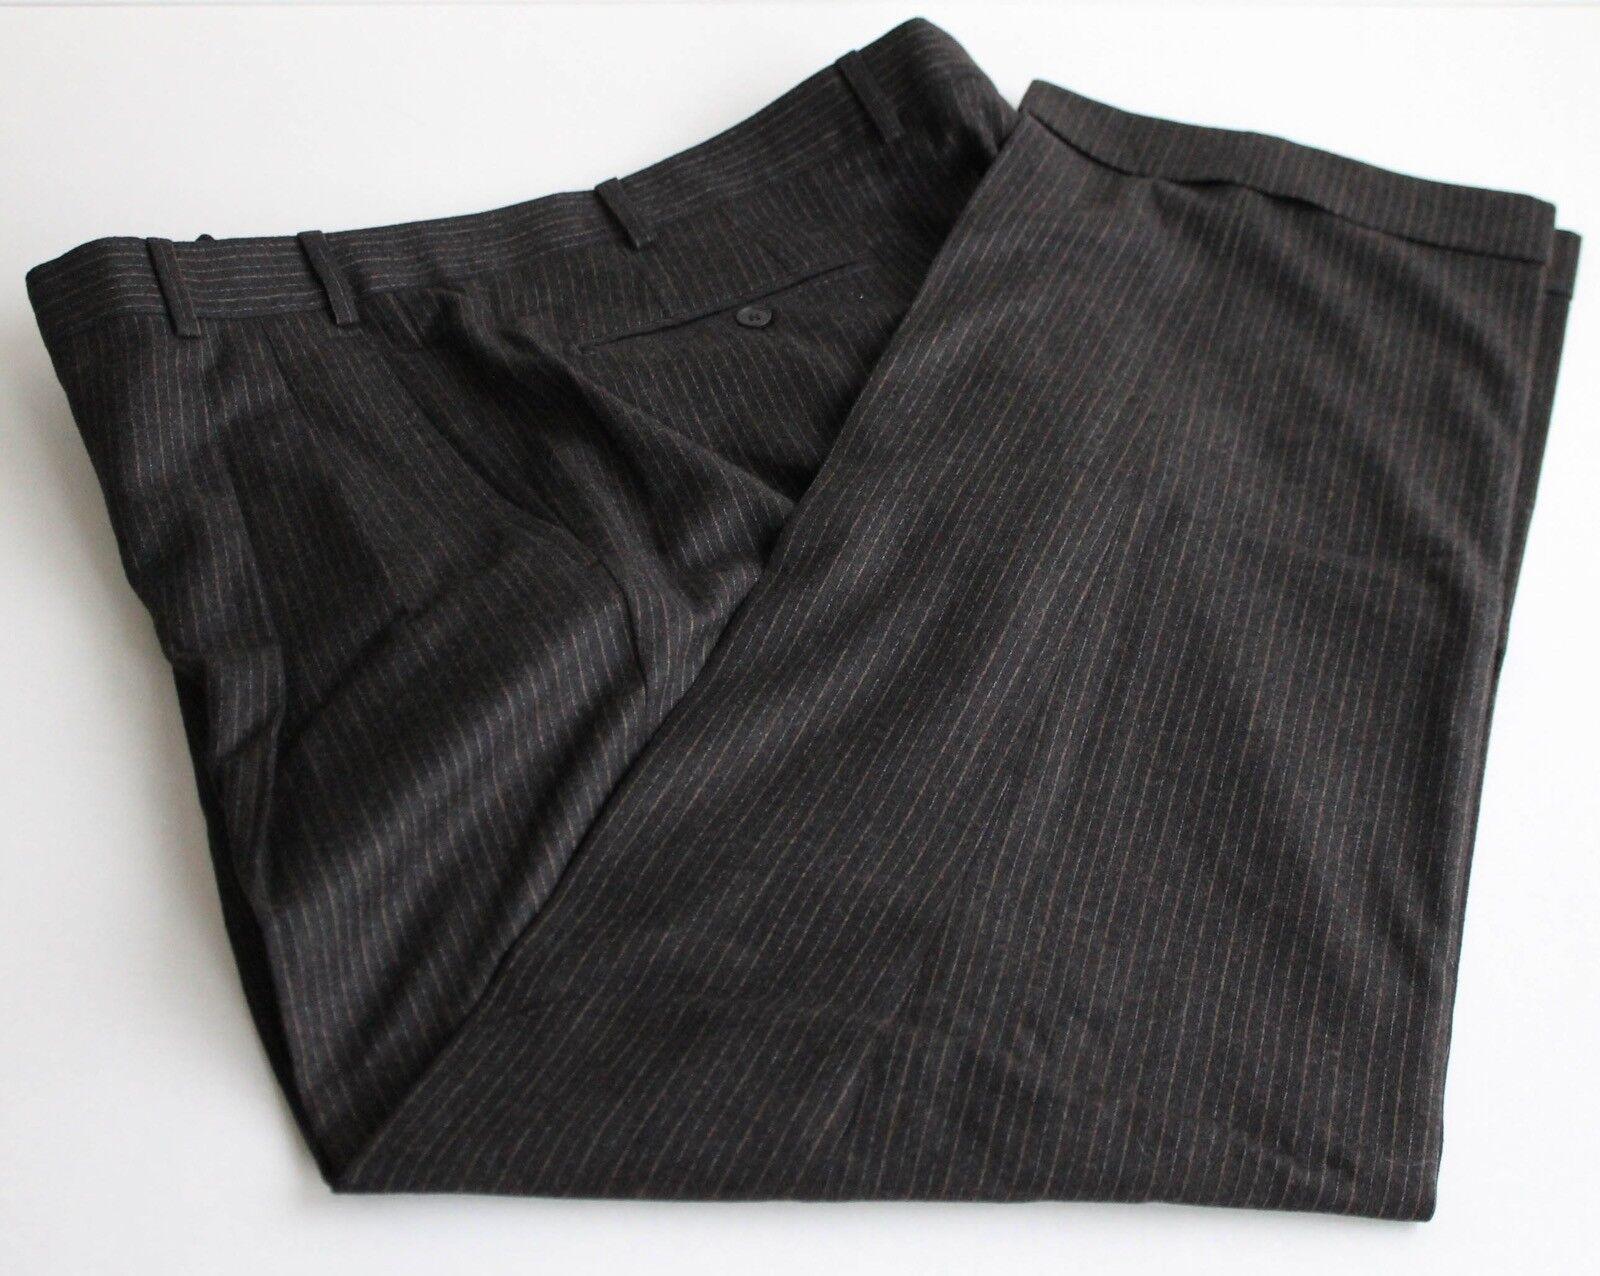 Zanella Milton Model Dark Brown Pinstripe Pants 100% Wool  39W 29L